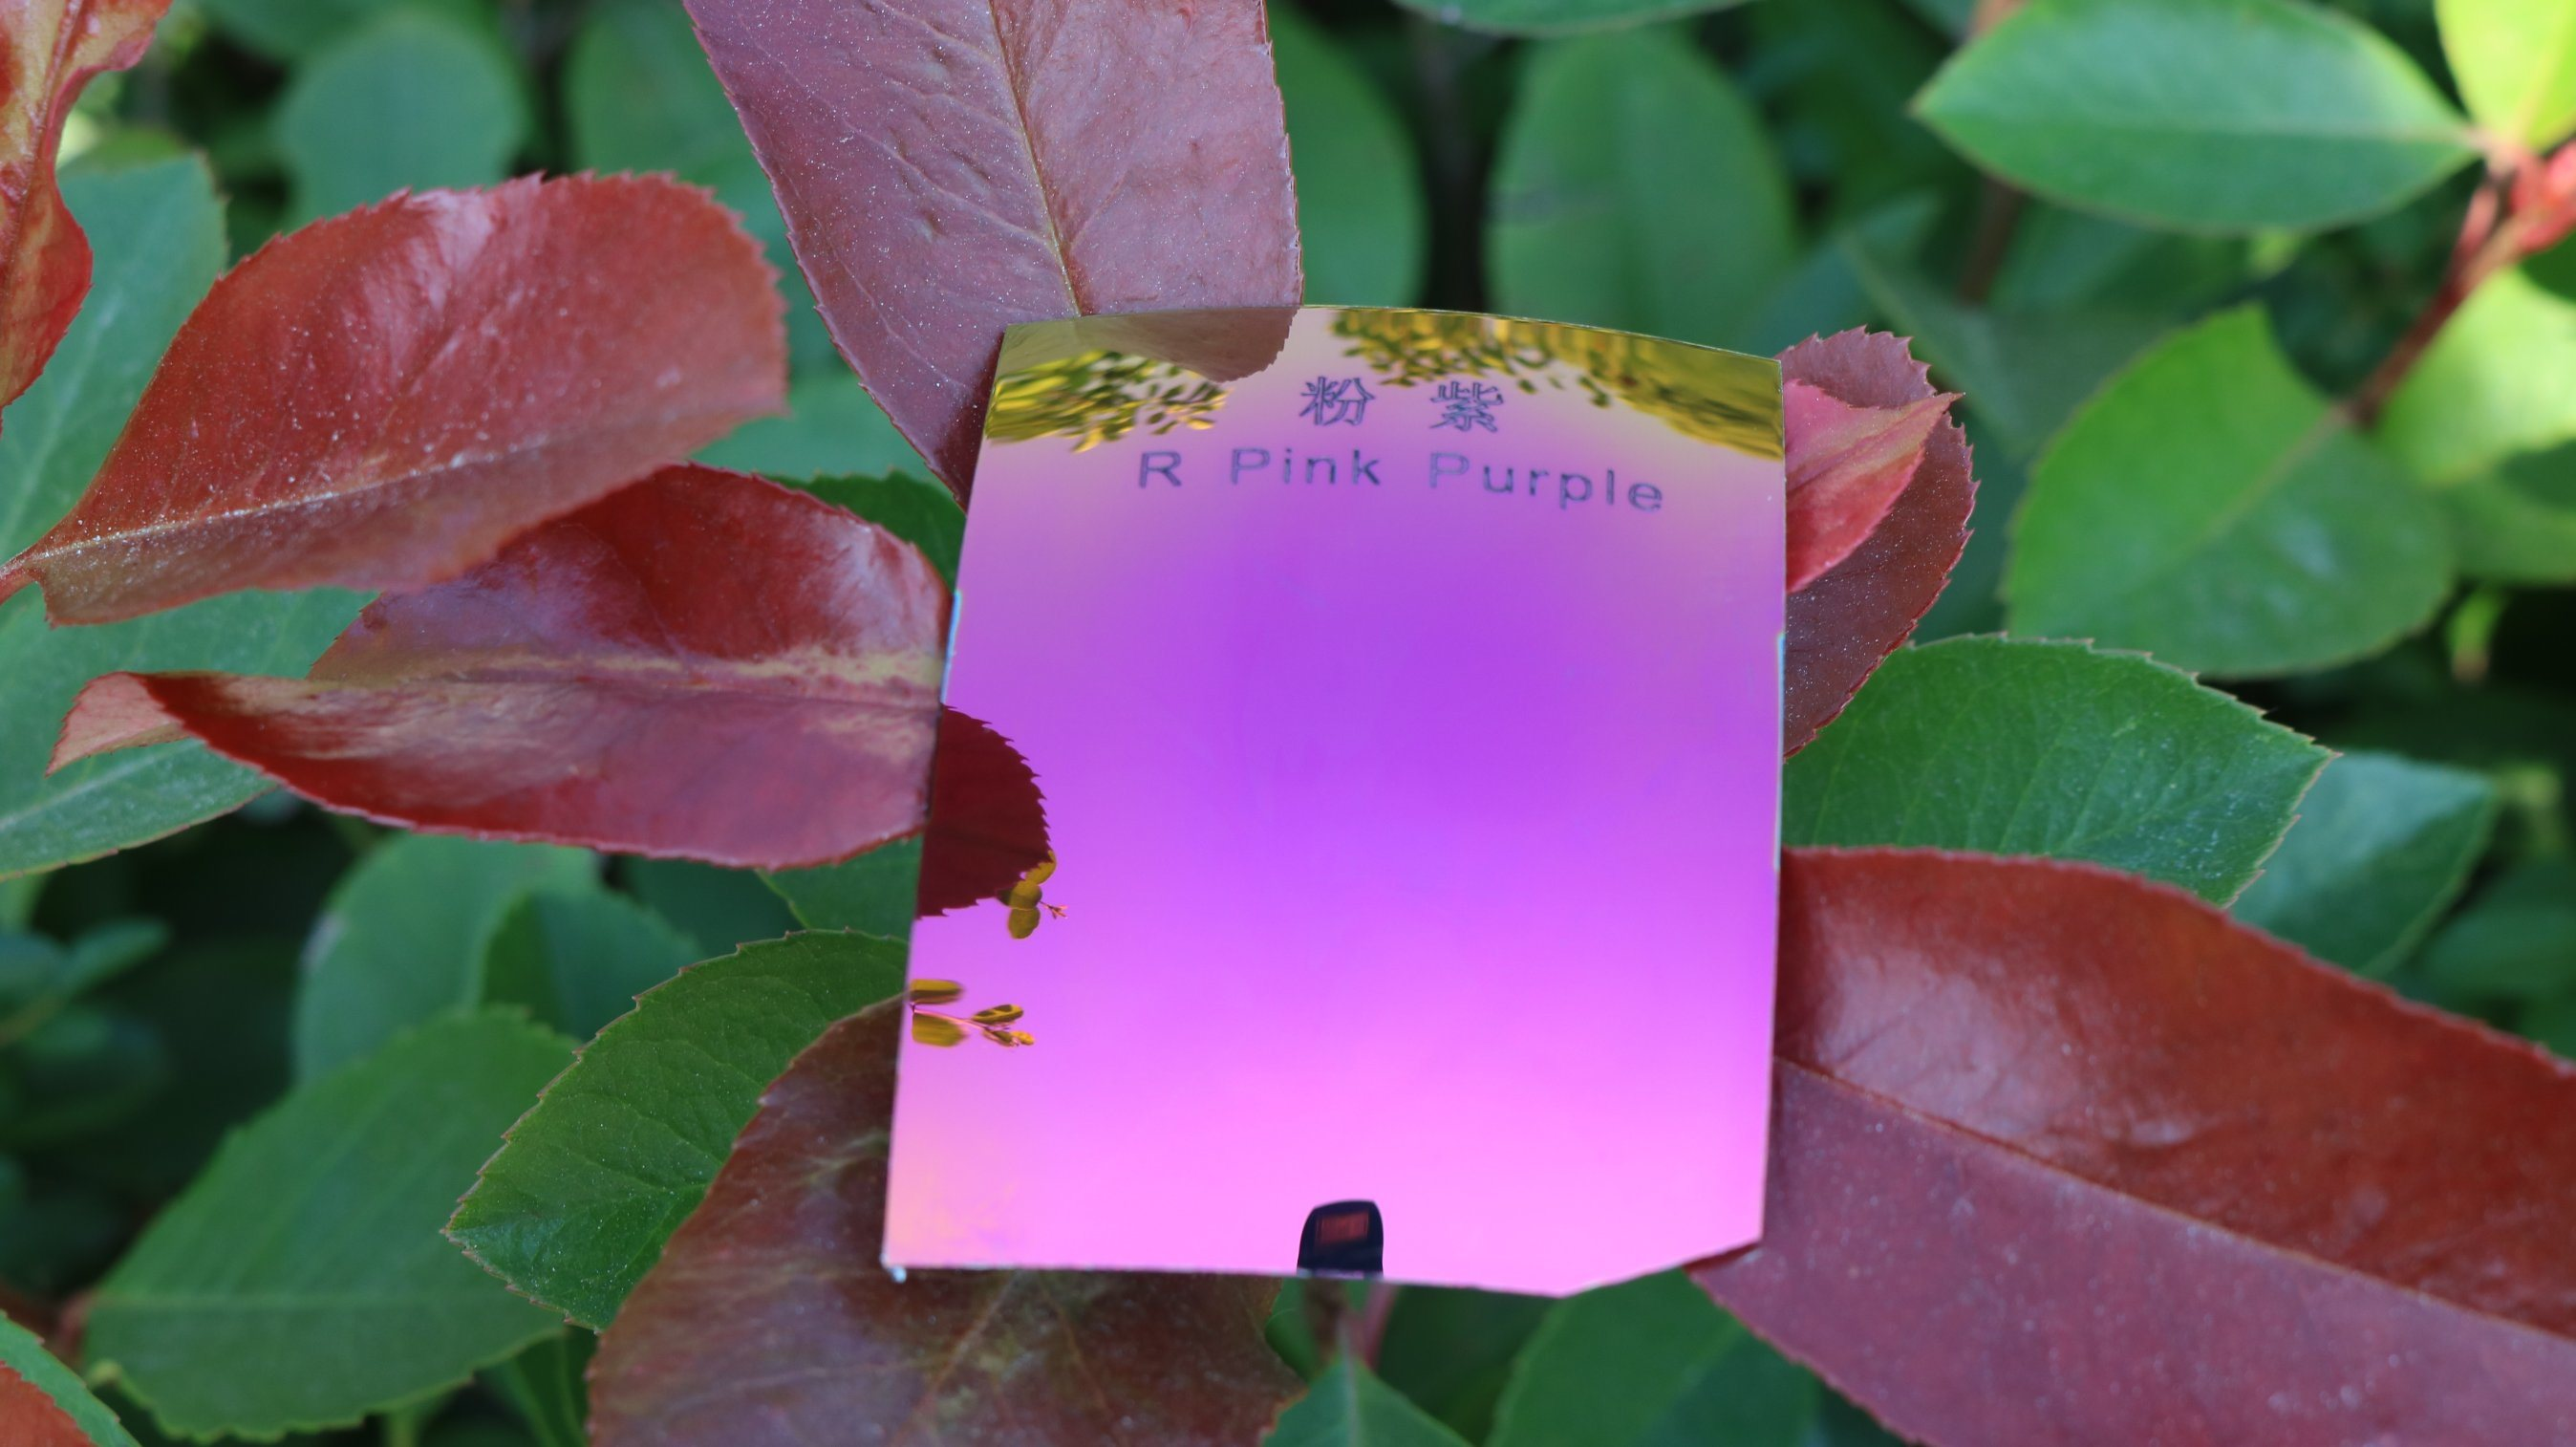 Colorful Eyeglasses Polarized Tac Lens (R Pink Purple)